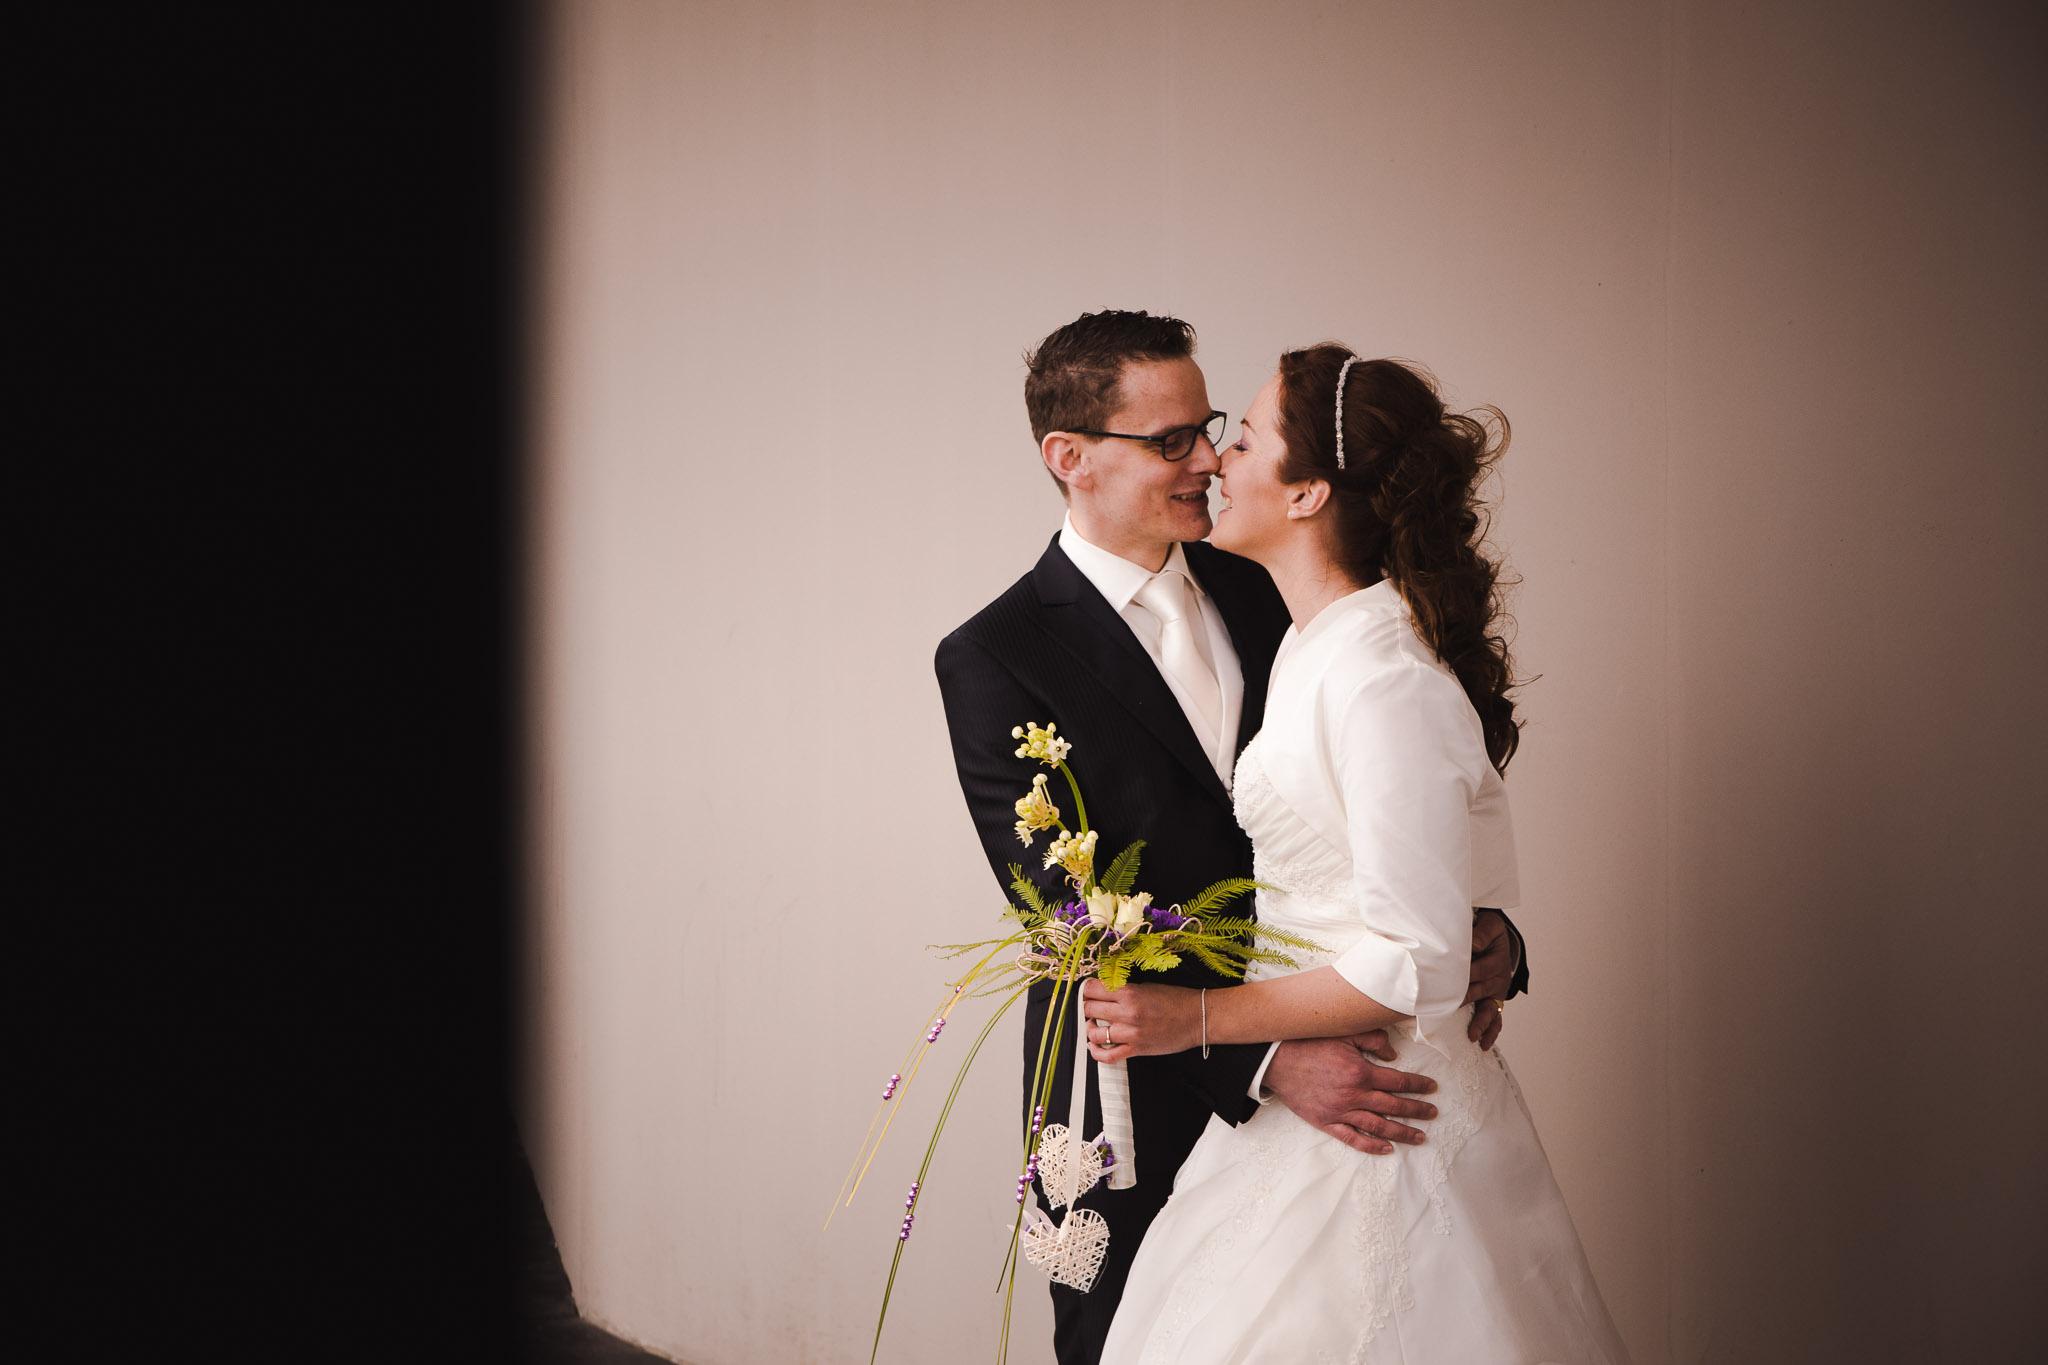 bruiloft veendam reportage anouk hilko portret